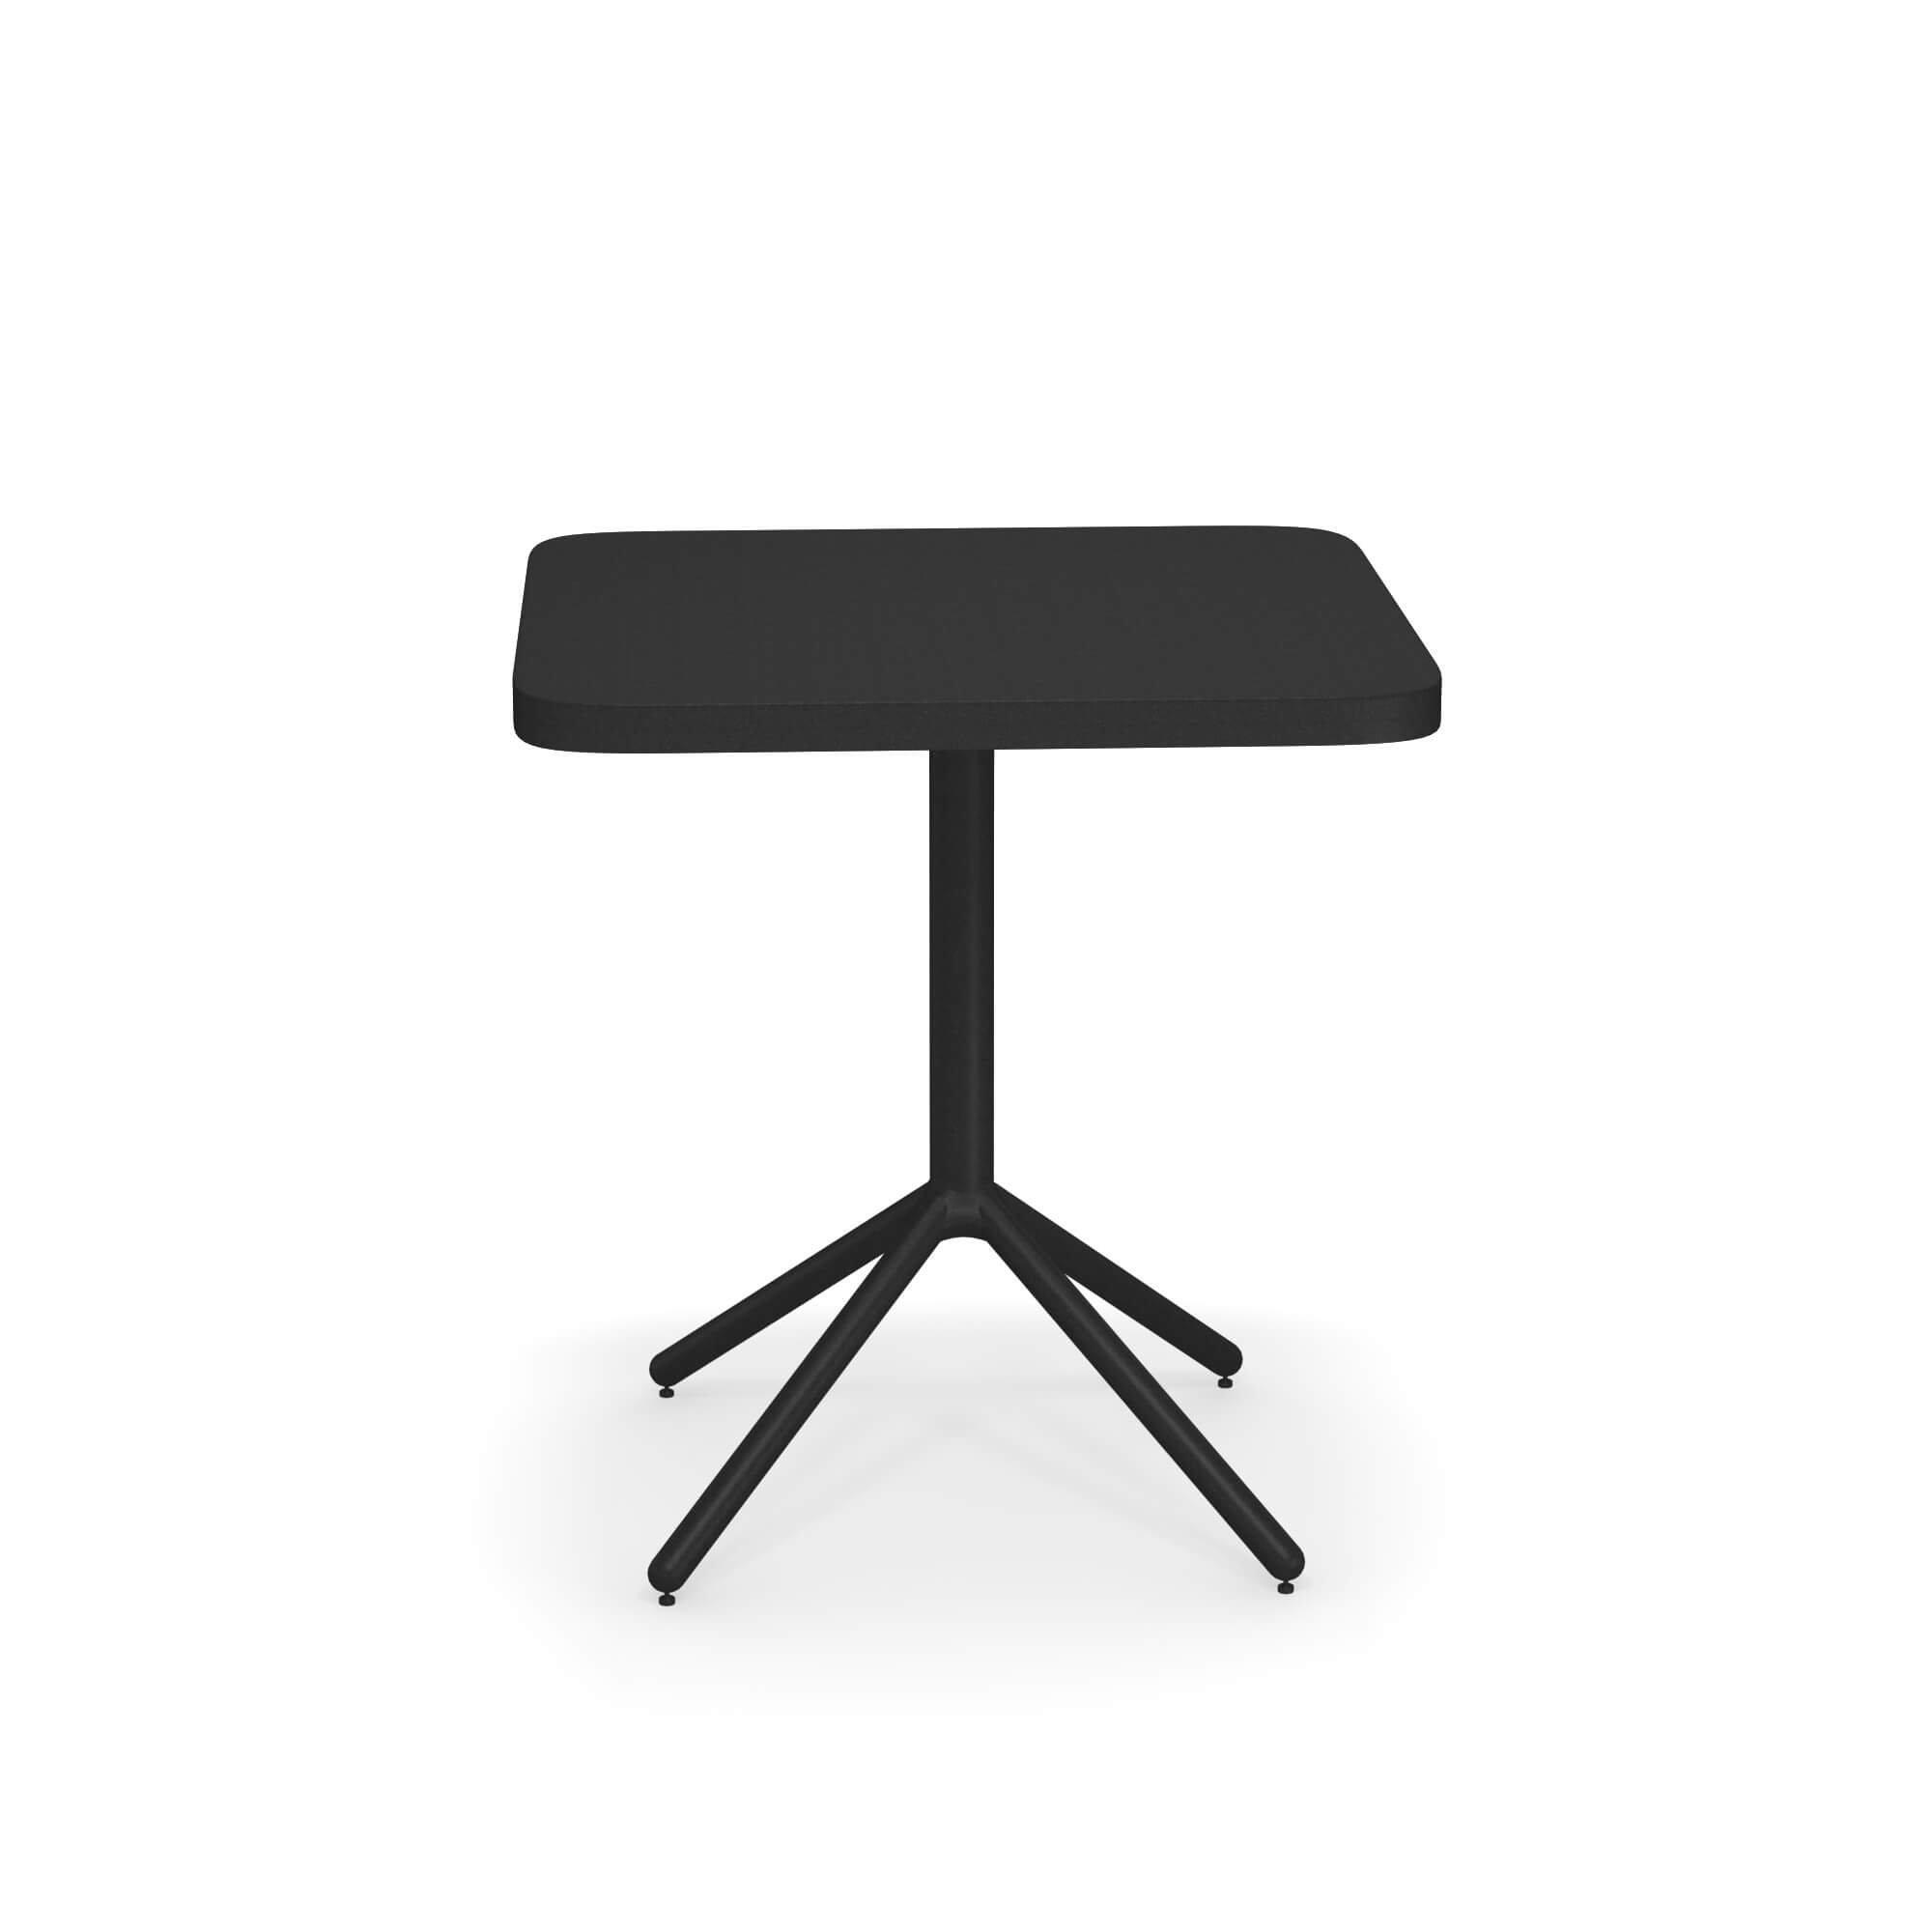 Grace Table  from Emu, designed by Samuel Wilkinson